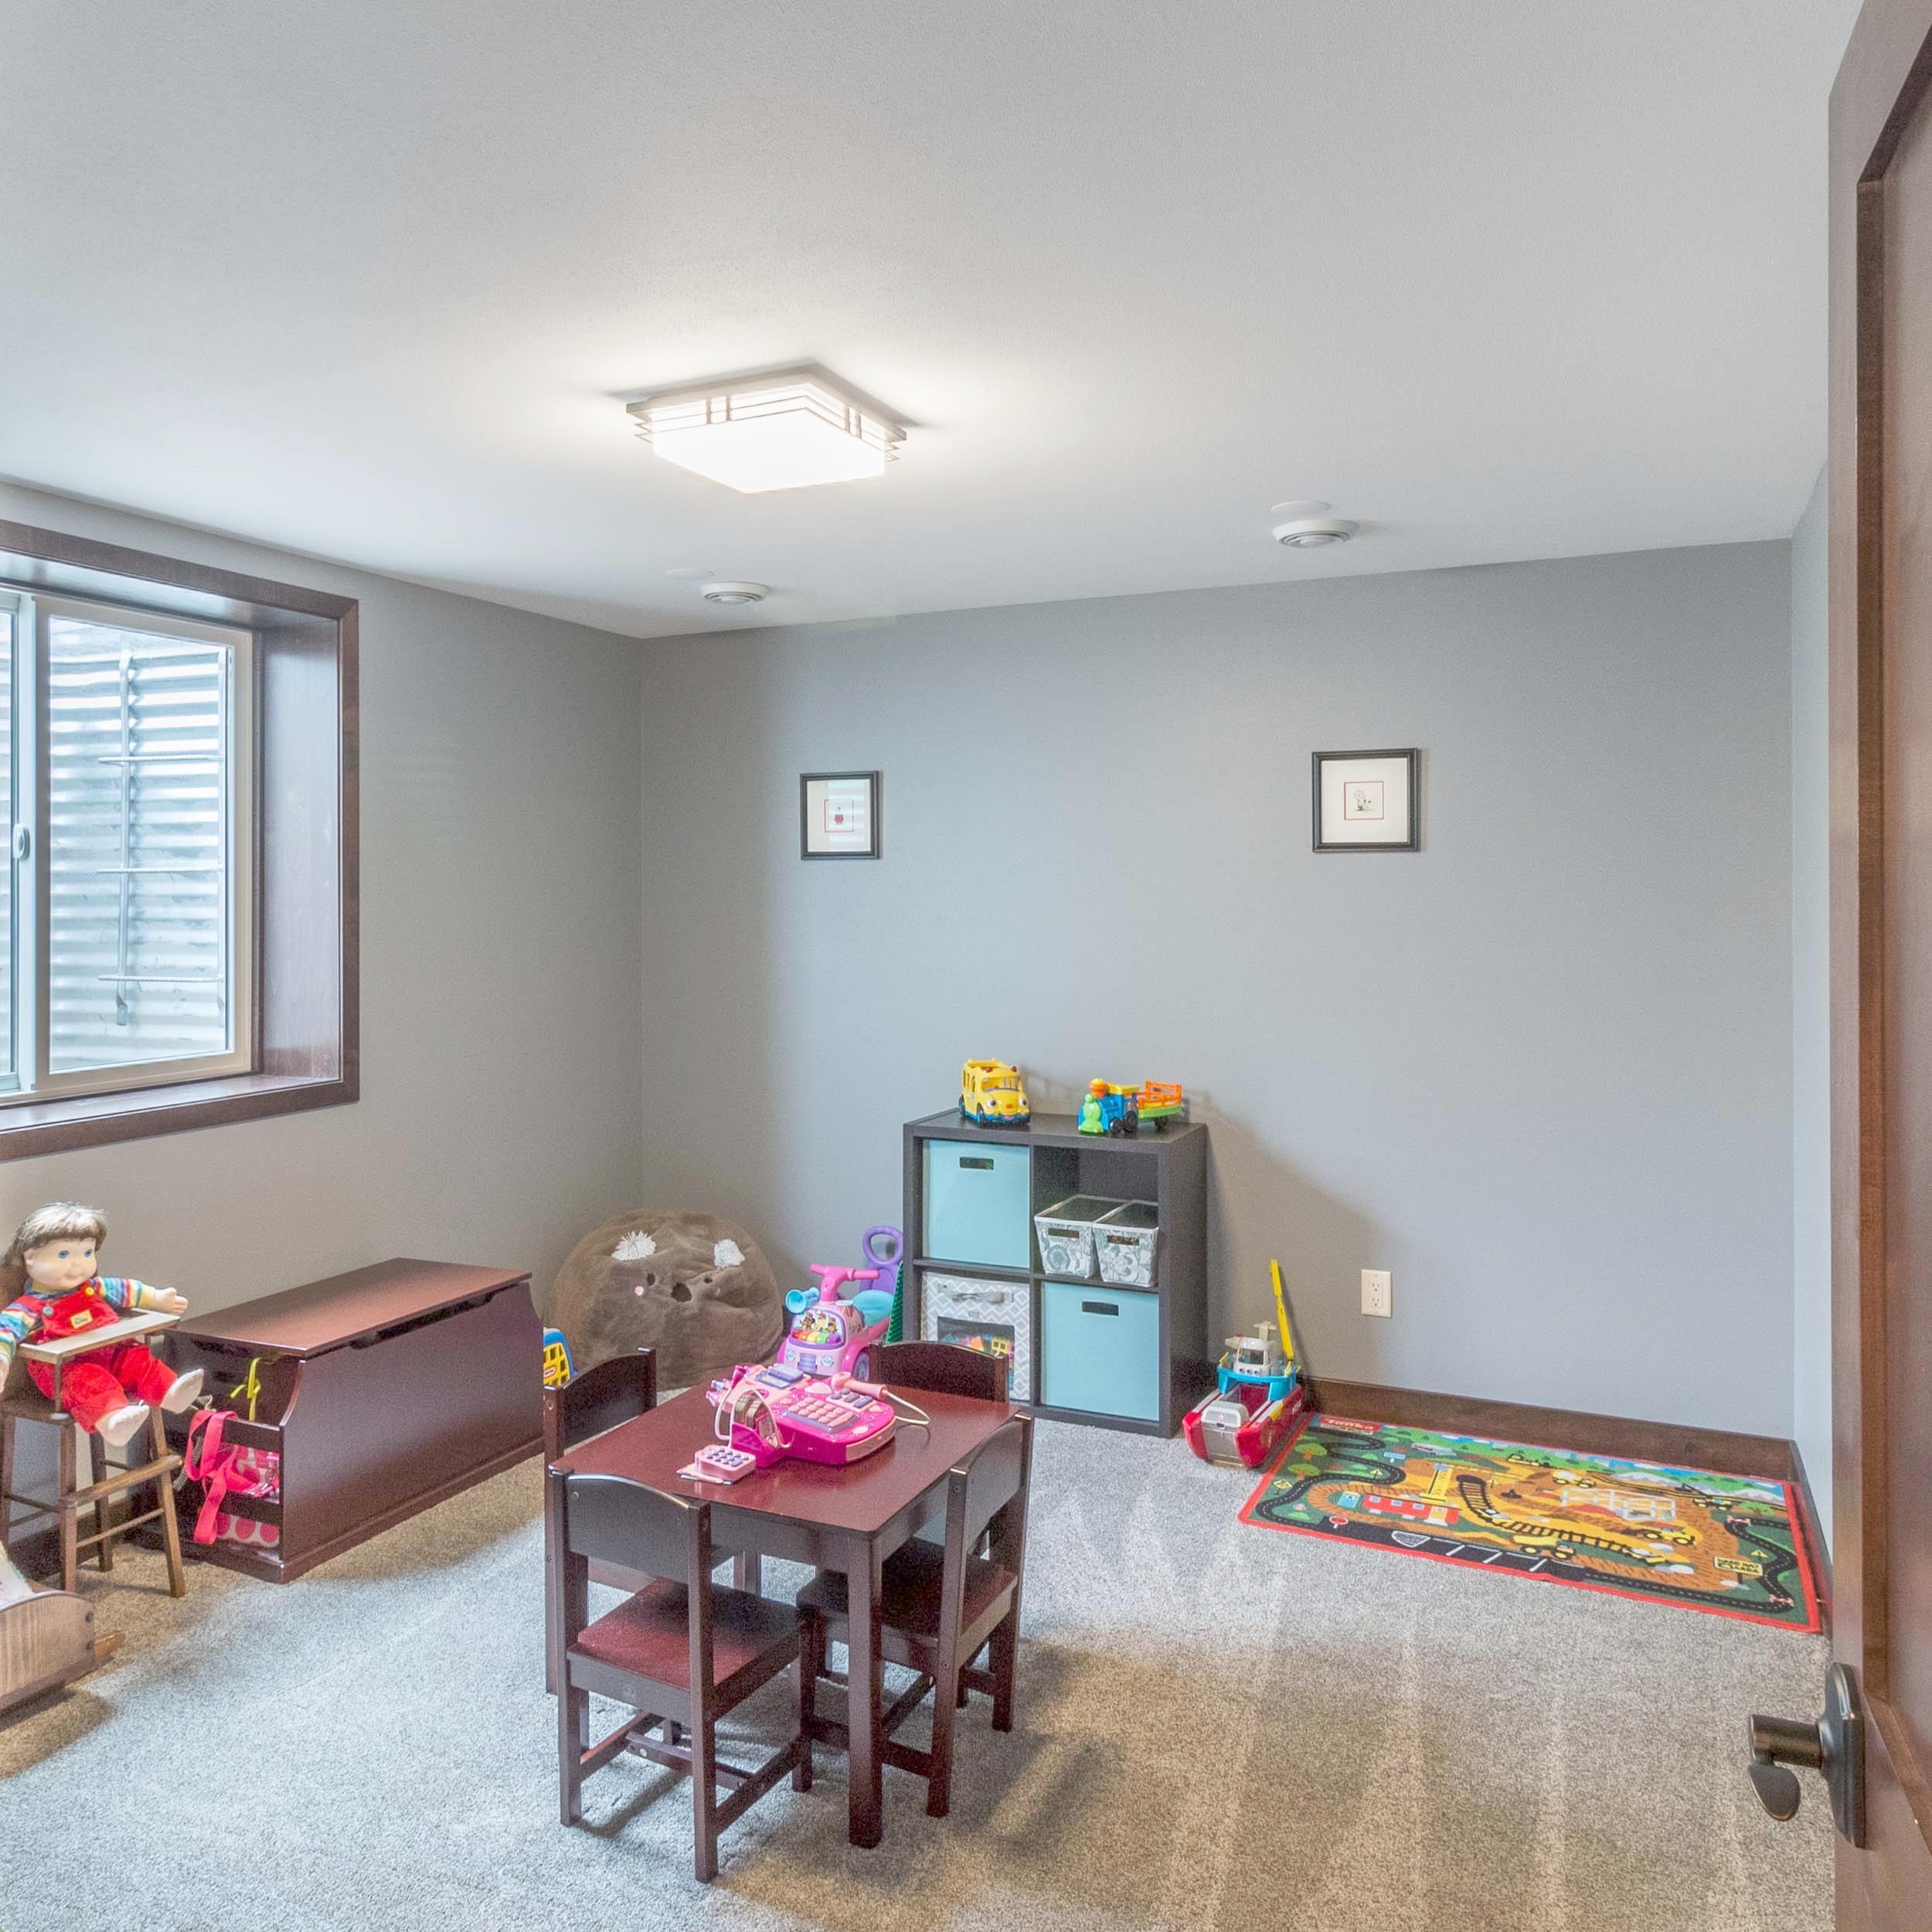 Egress Windows In The Children's Playroom